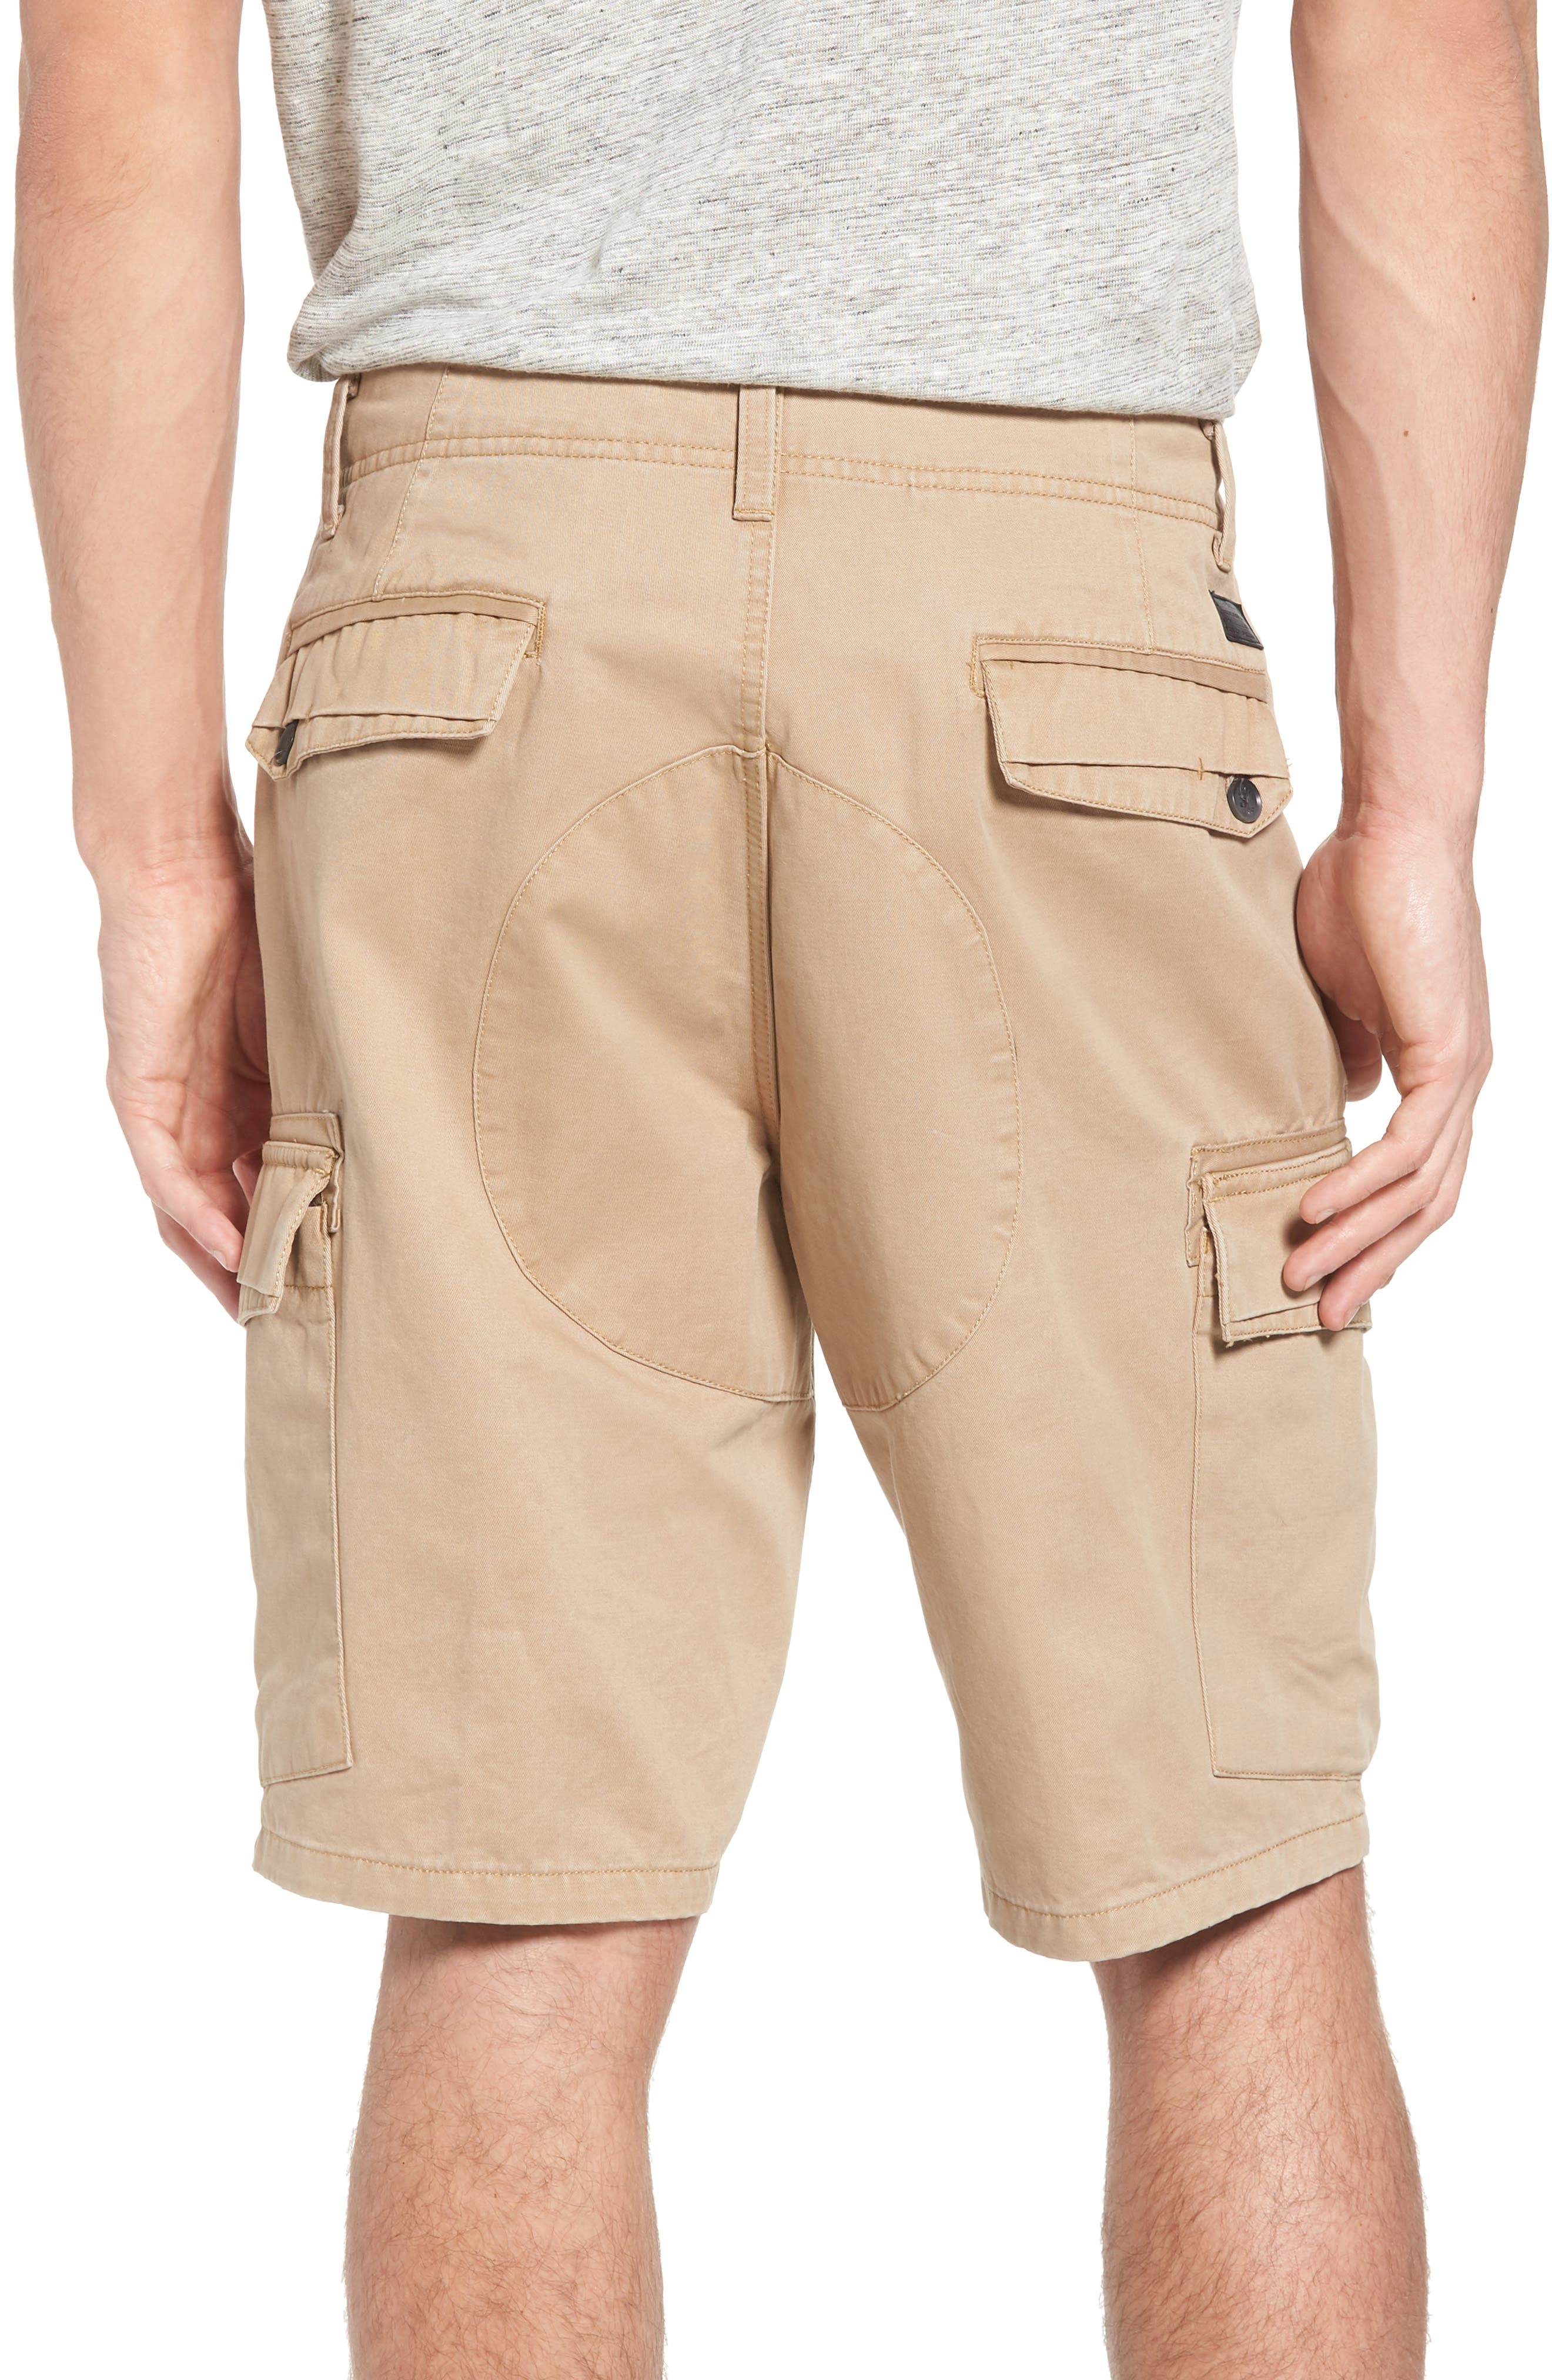 Campbell Cargo Shorts,                             Alternate thumbnail 2, color,                             Khaki